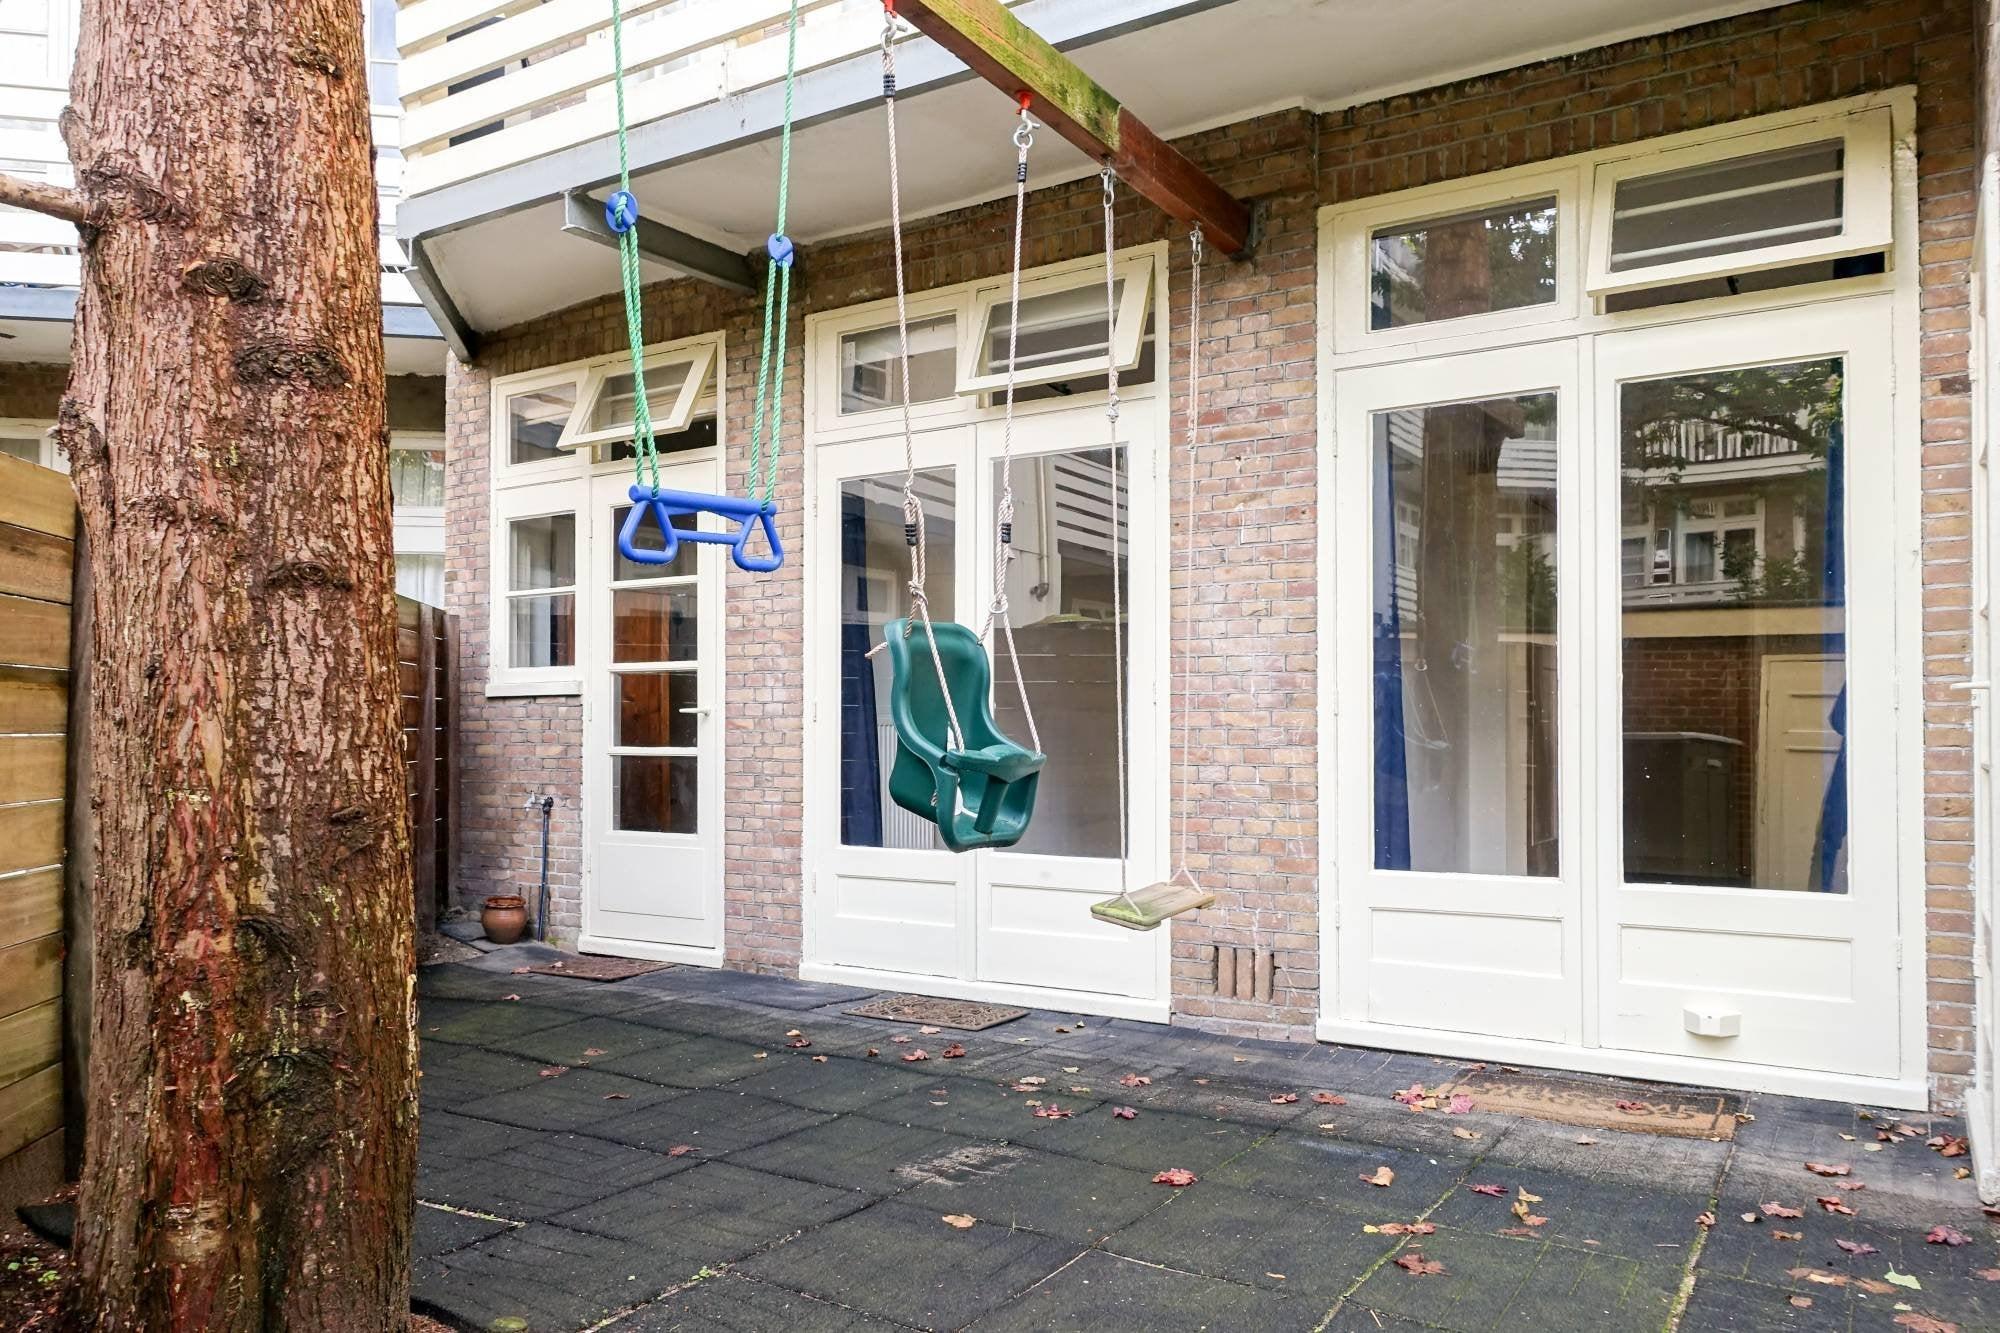 Botticellistraat, Amsterdam